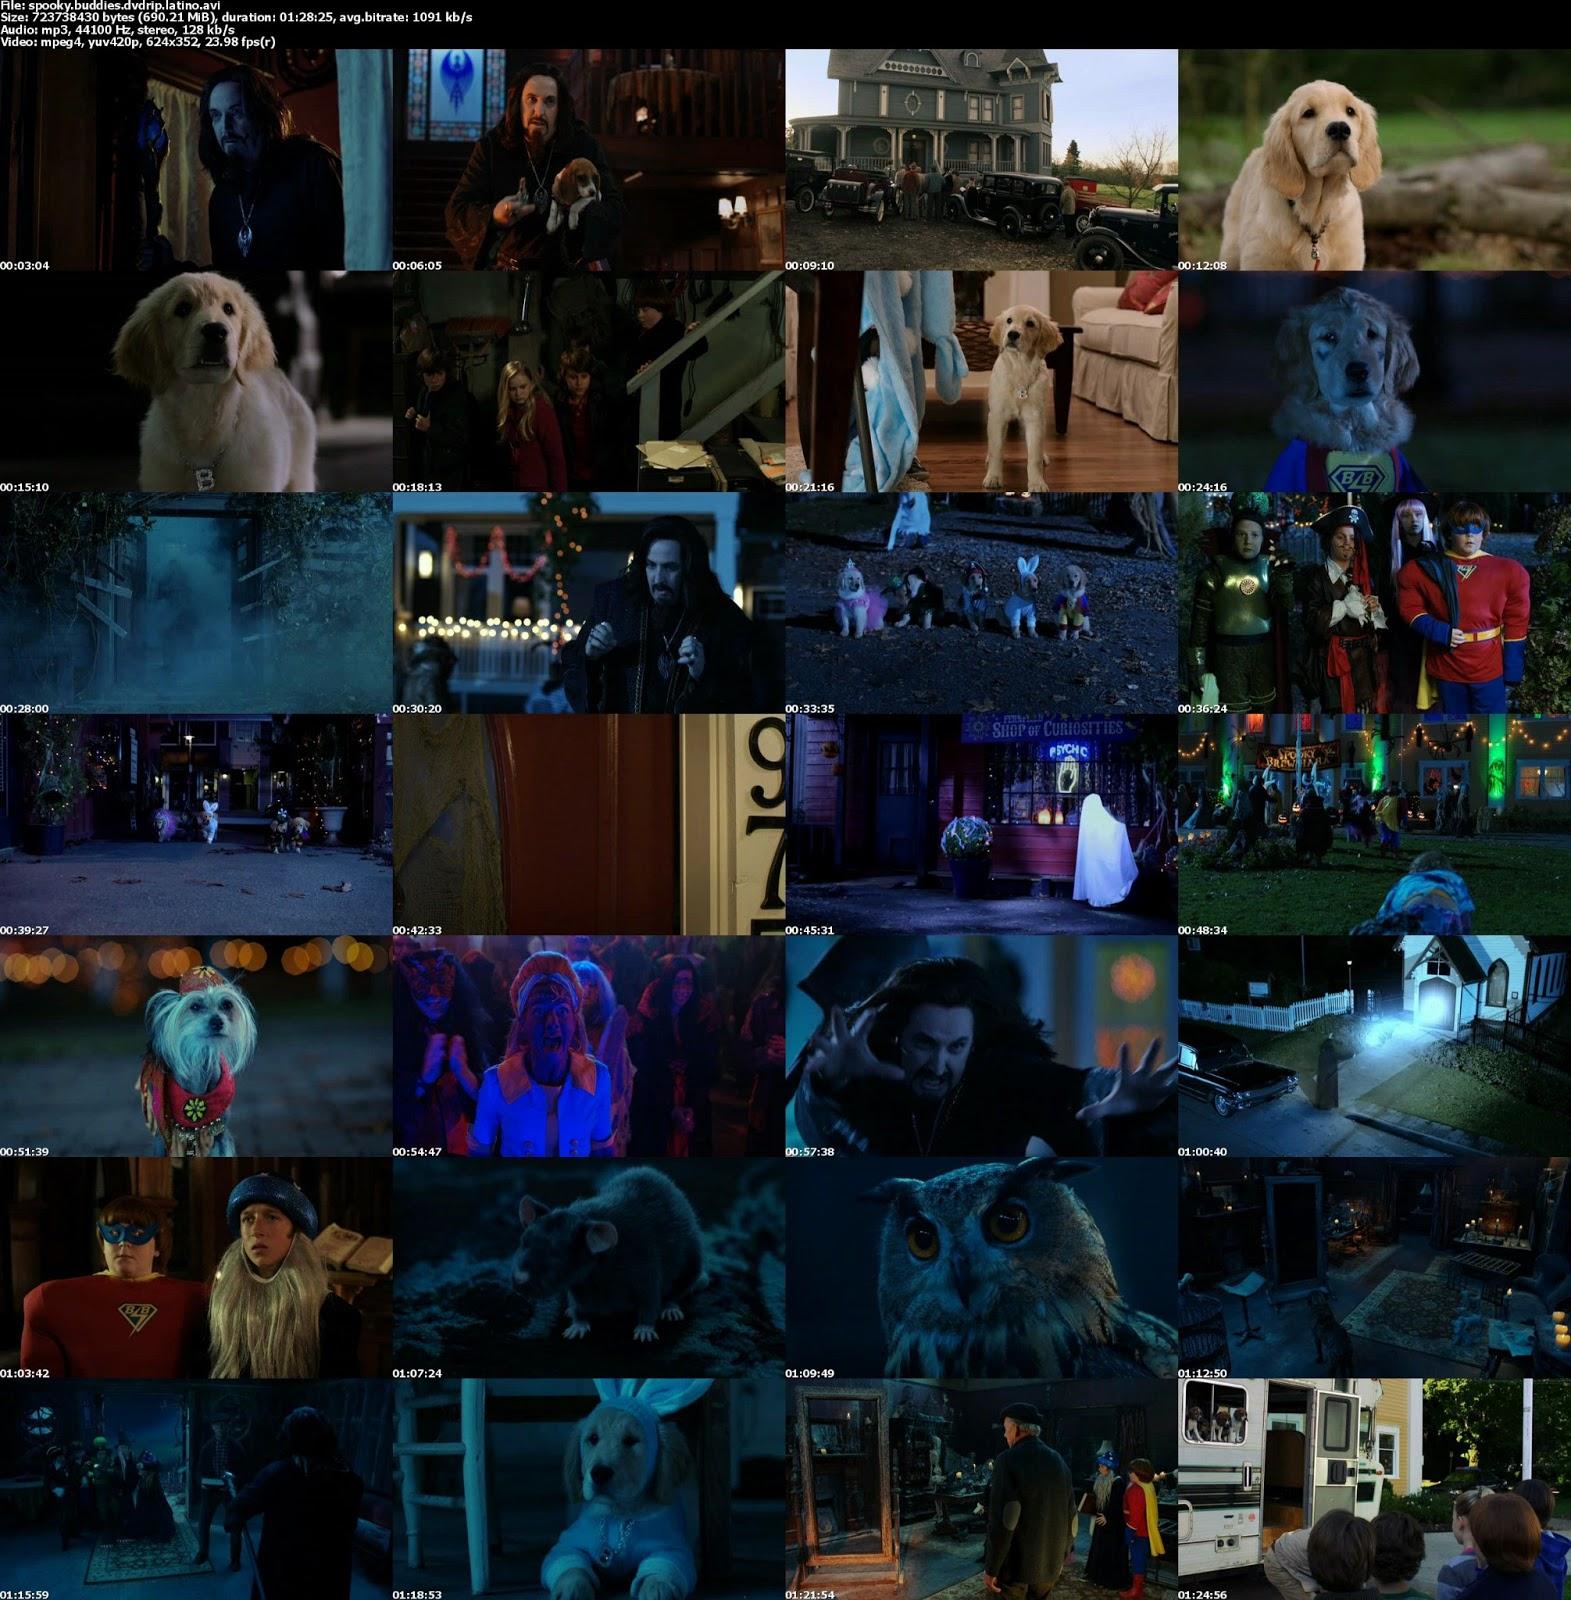 Spooky Buddies (2011), Movies On Dvd